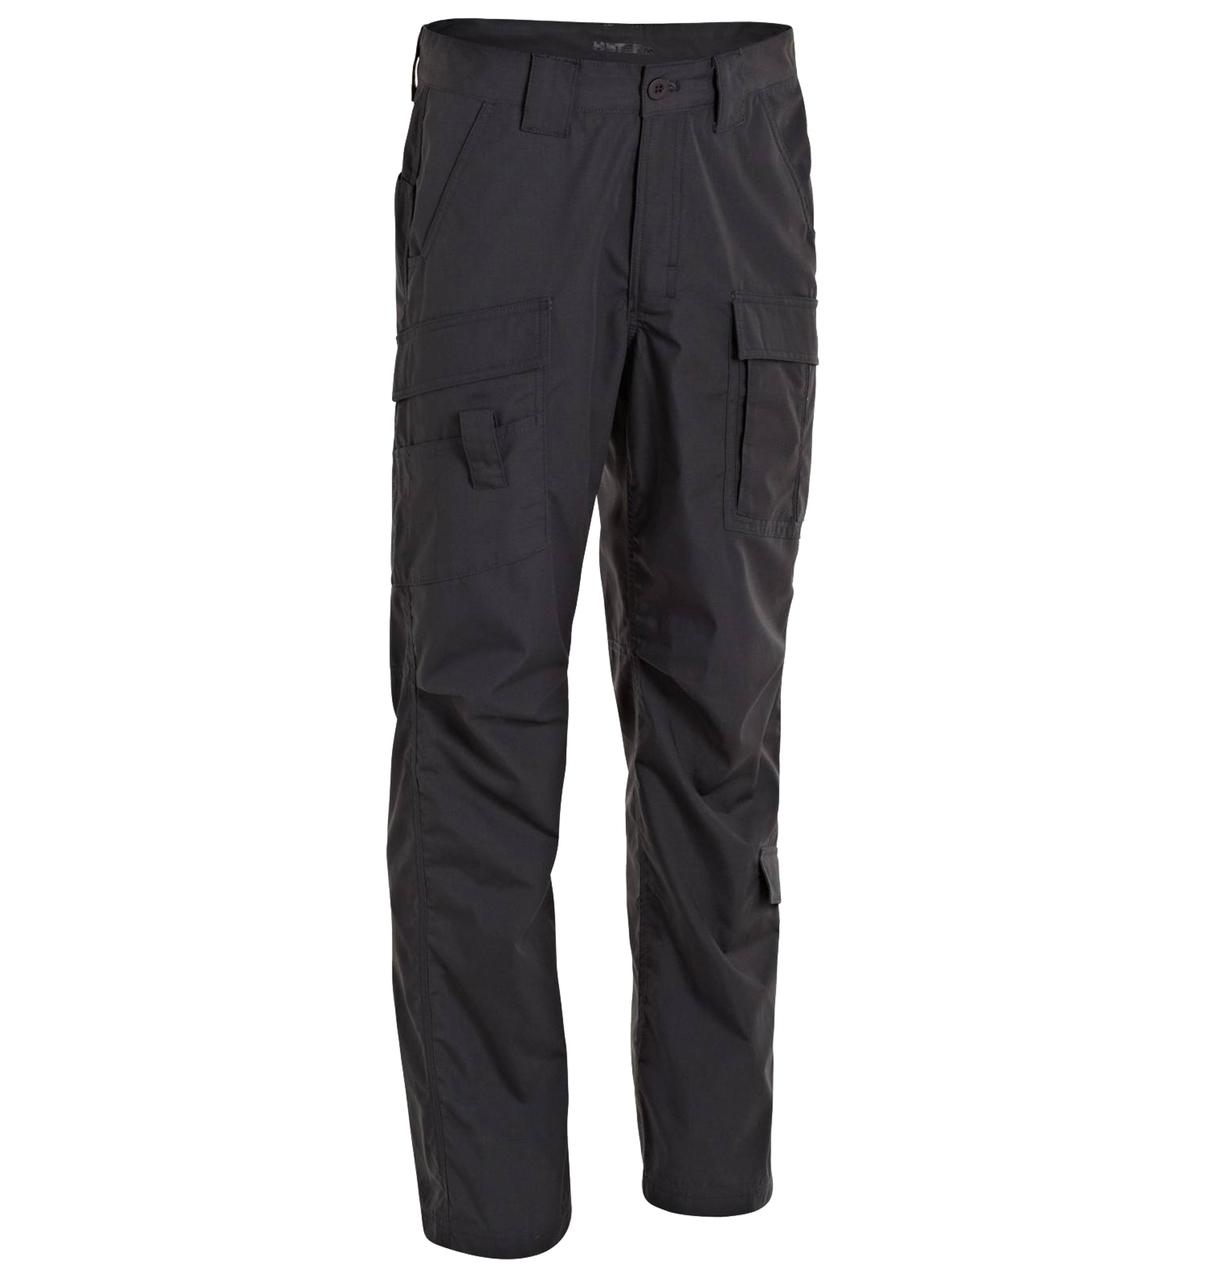 Under Armour Tactical Medic Pants